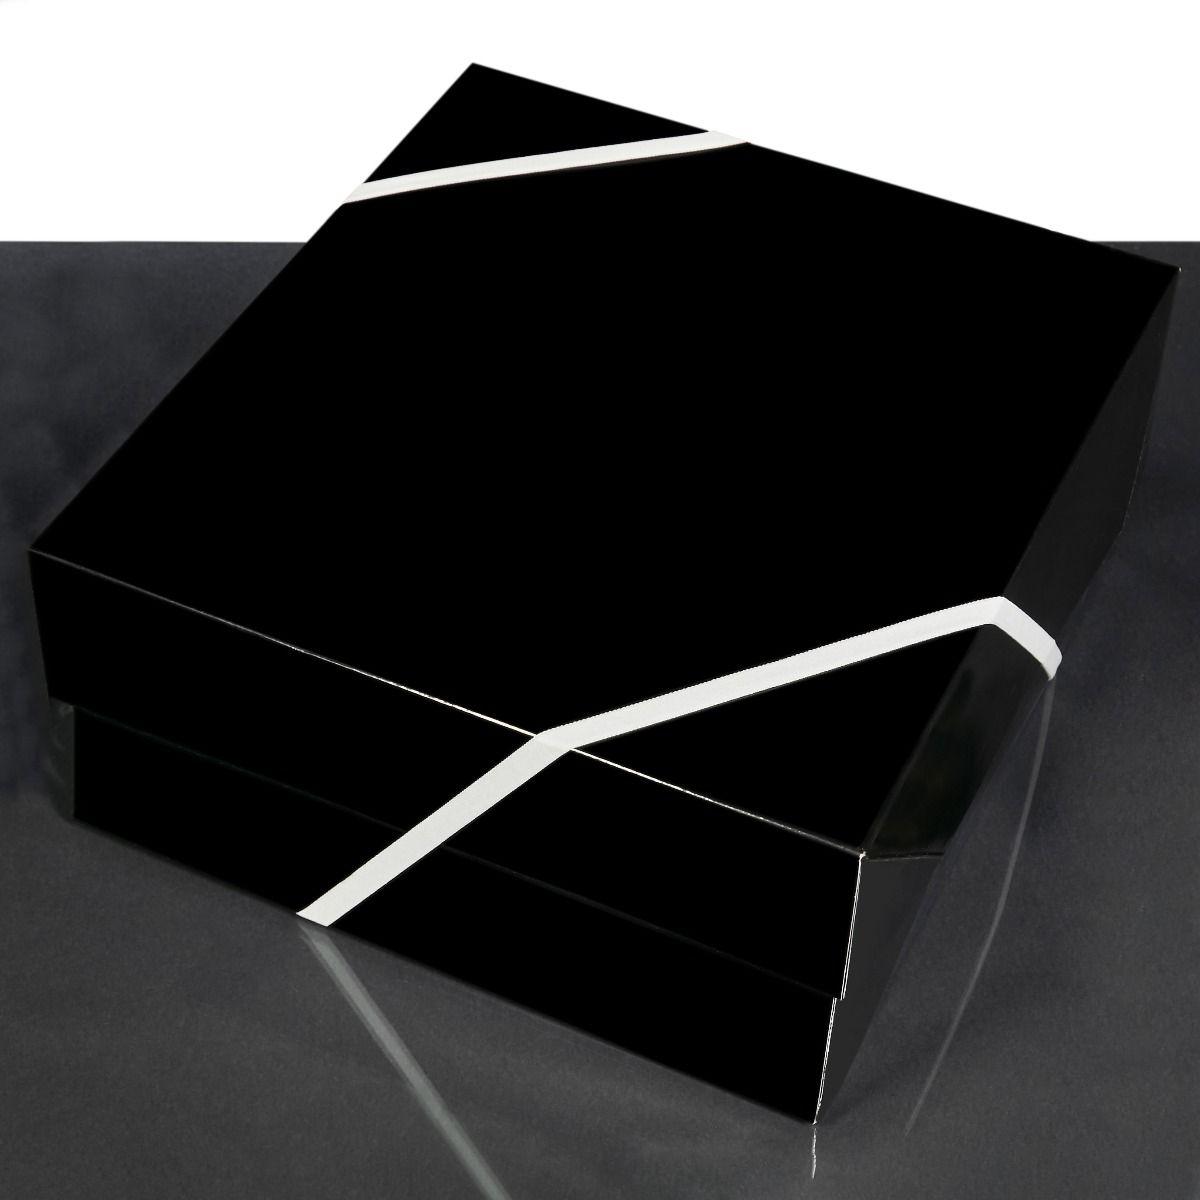 Large Glossy Black Gift Box Add-On